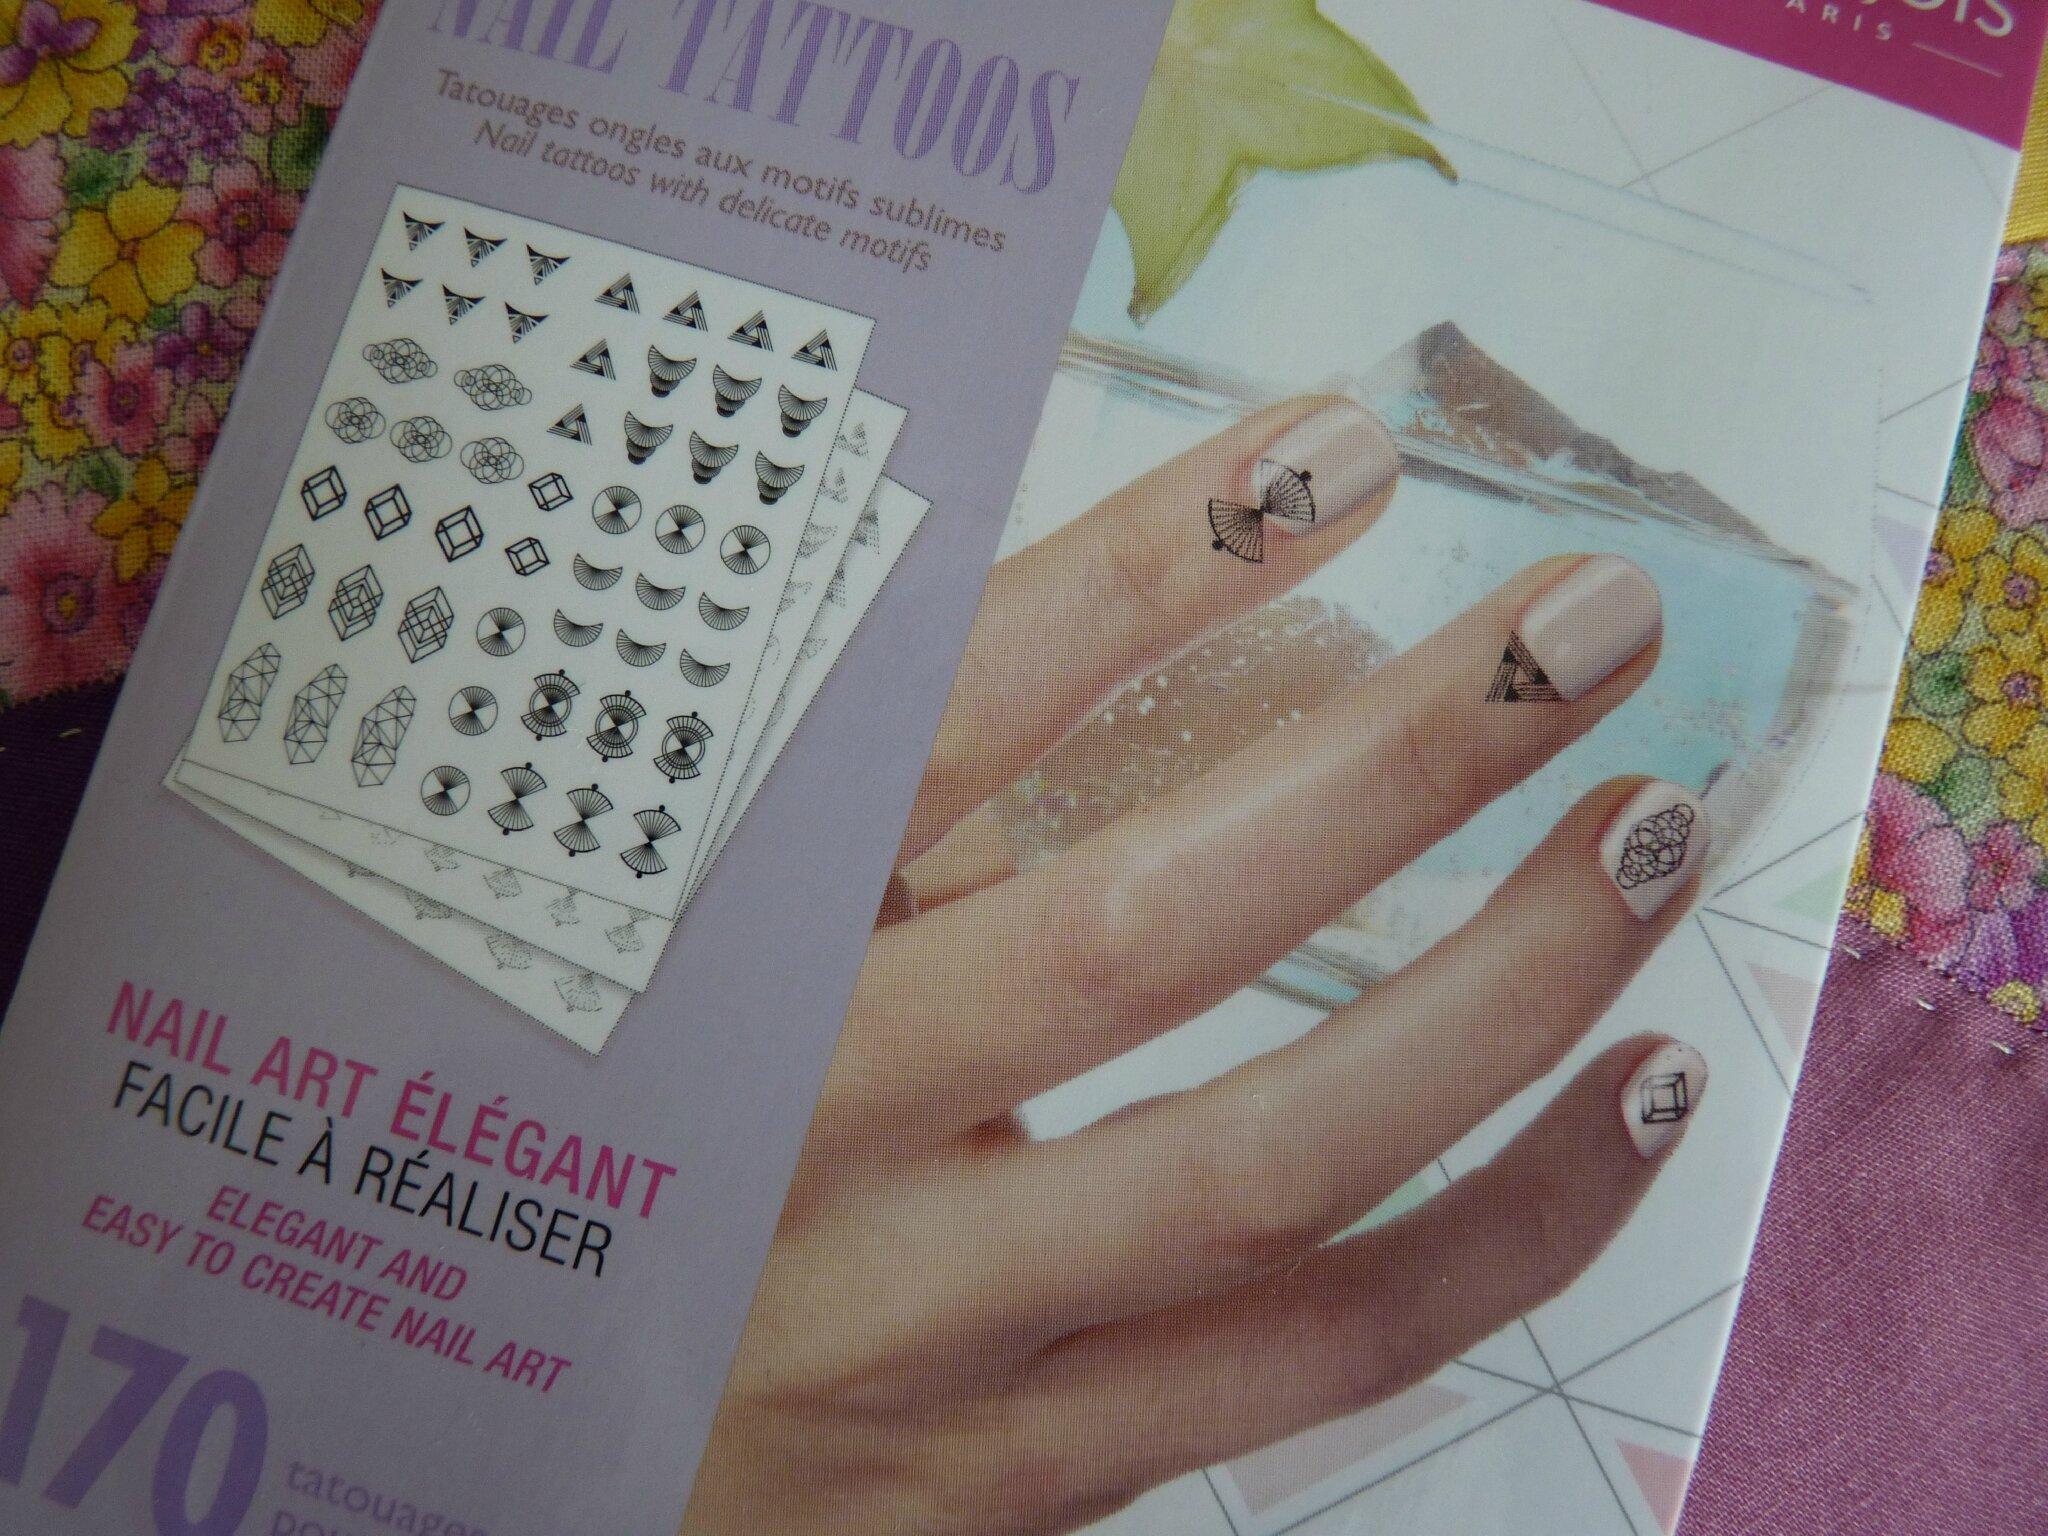 Bourjois : des tatoos pour mes ongles !